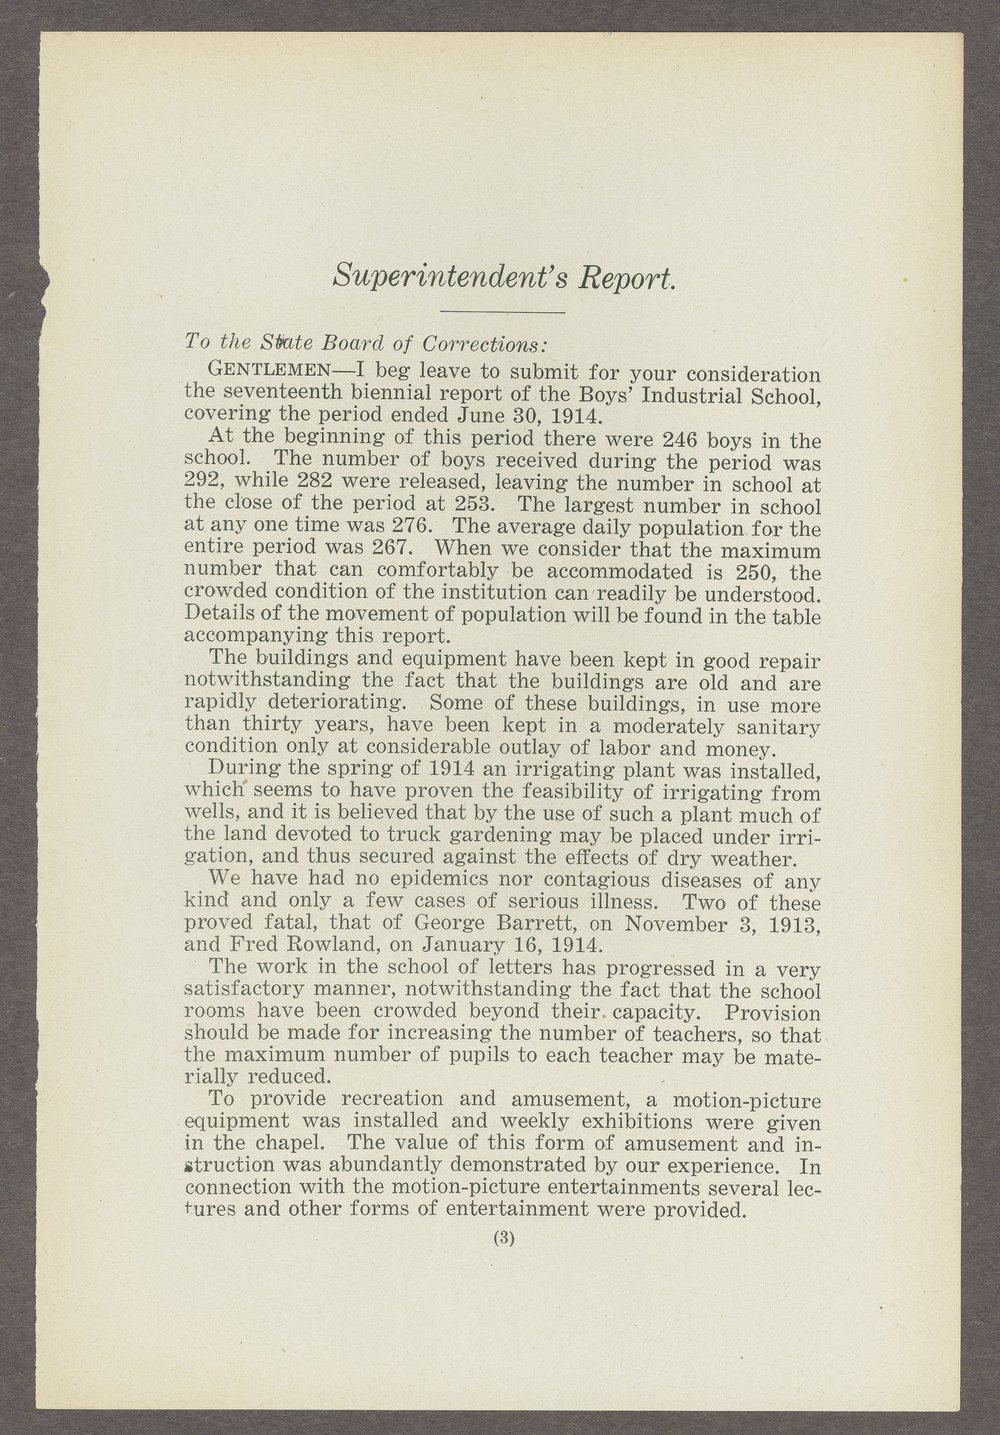 Biennial report of the Boys Industrial School, 1914 - 3